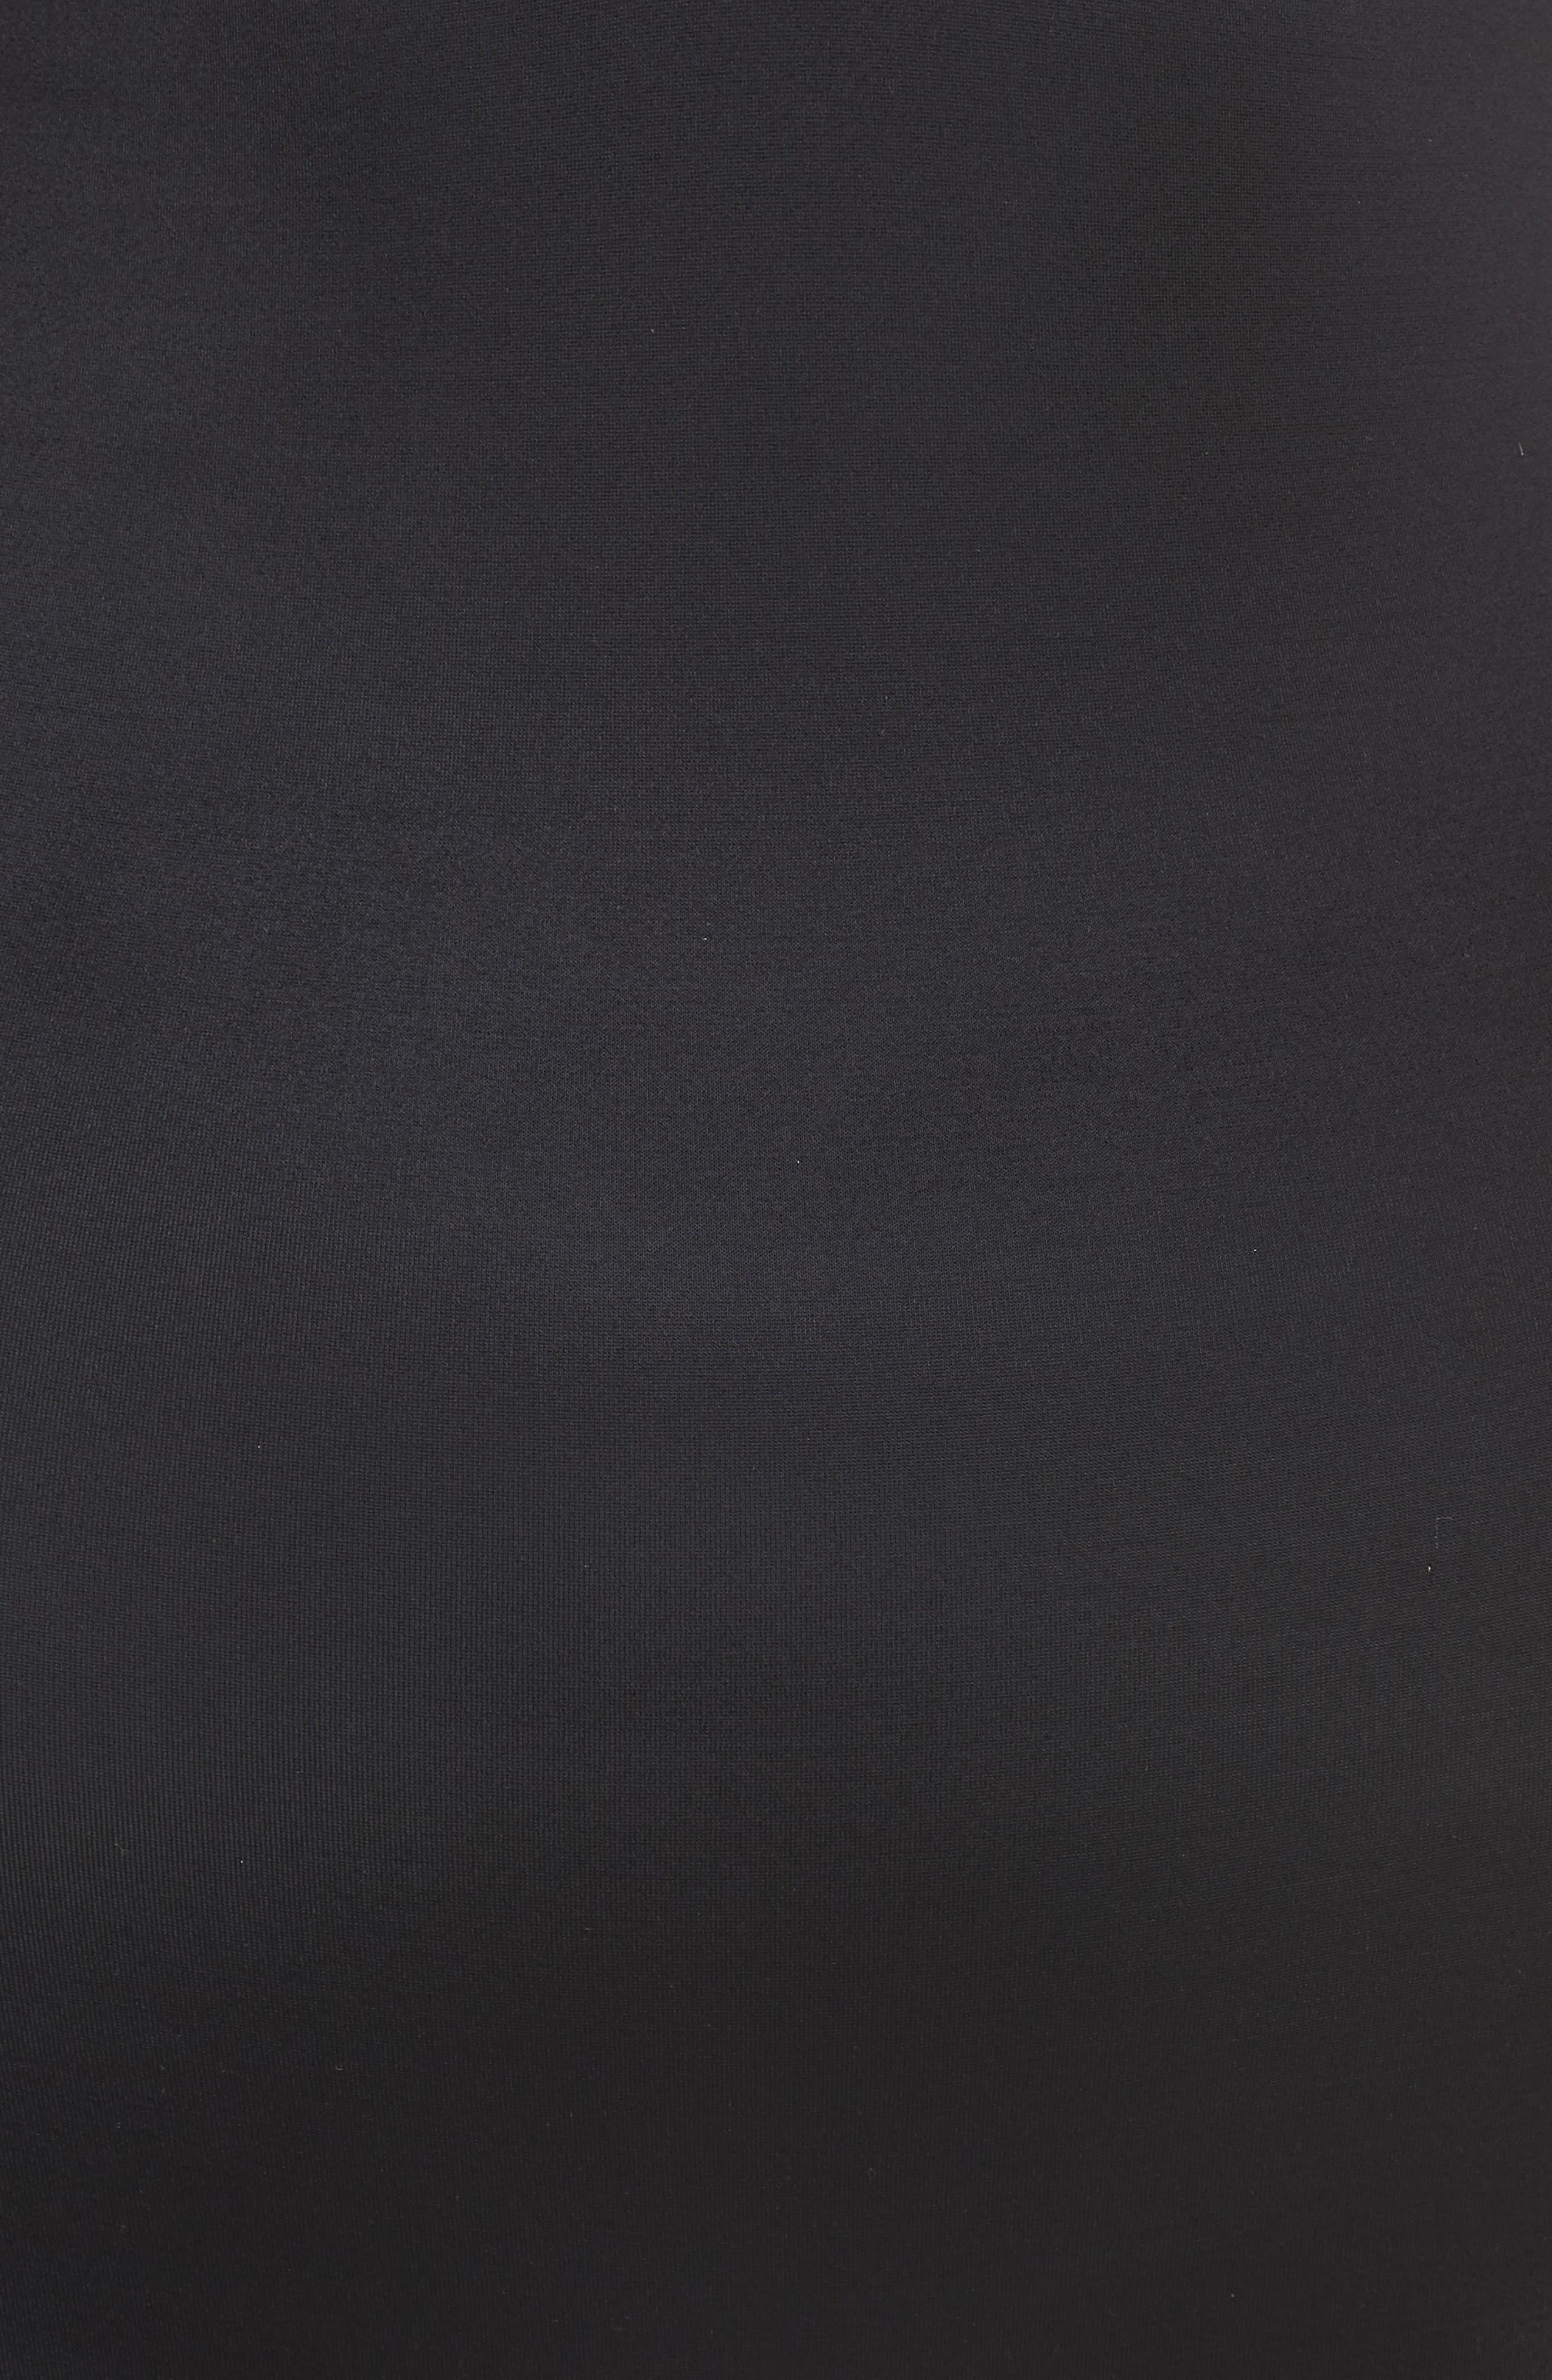 Suit Your Fancy Plunge Low-Back Mid-Thigh Bodysuit,                             Alternate thumbnail 6, color,                             VERY BLACK